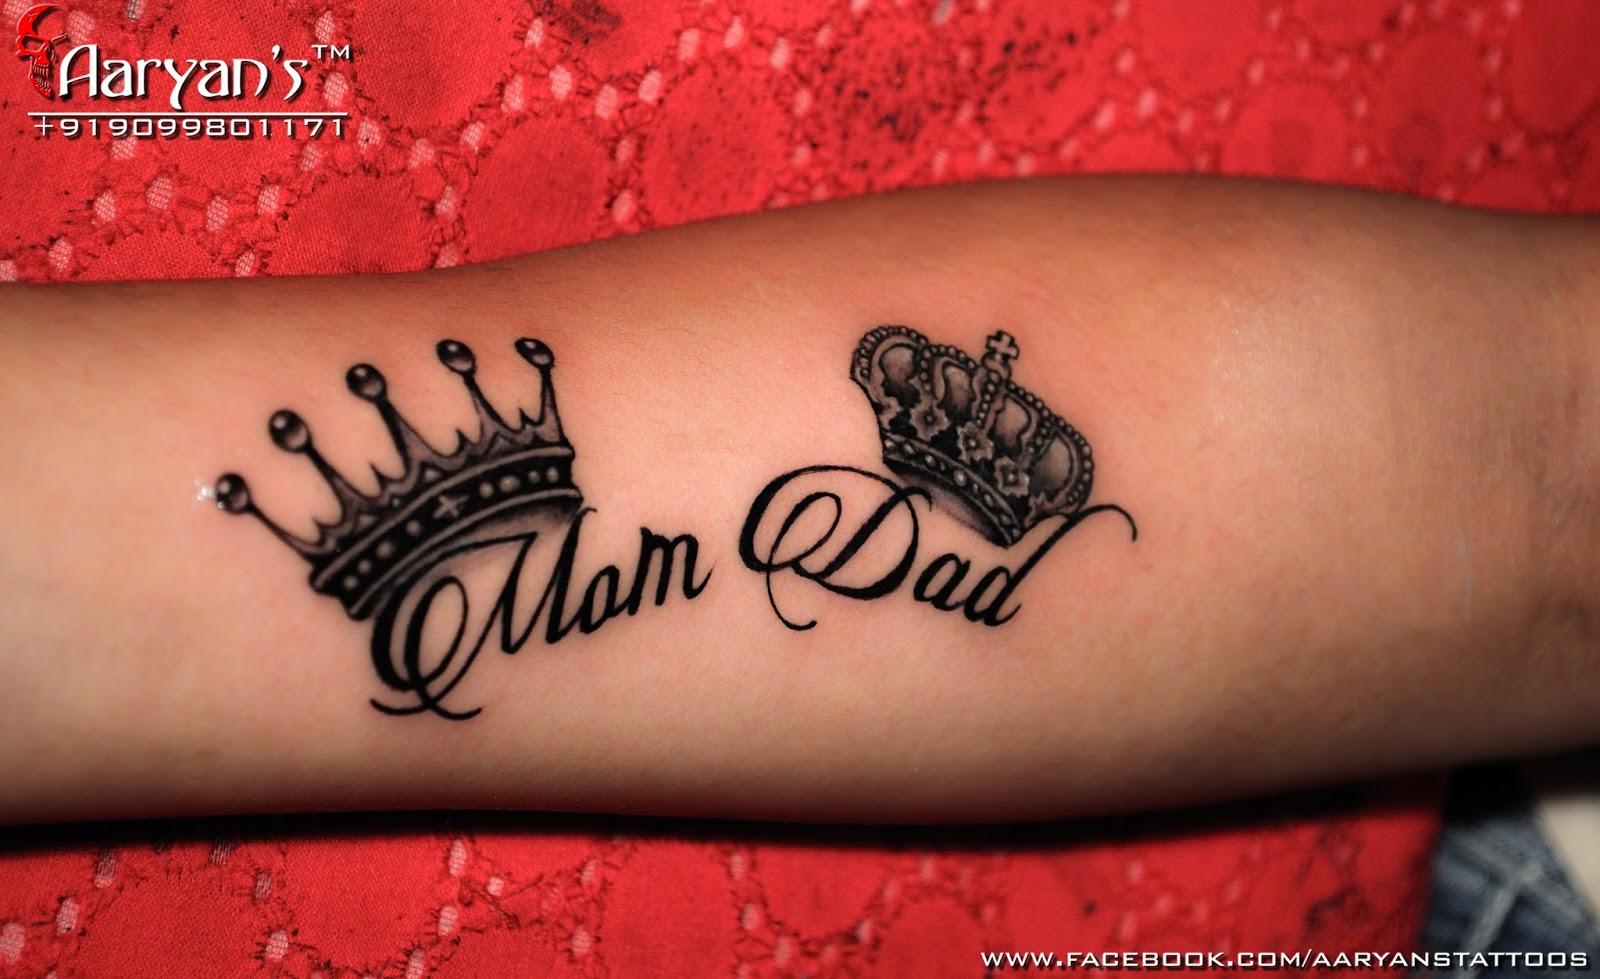 Love Your Dad Tattoo: Mom Dad Tattoos